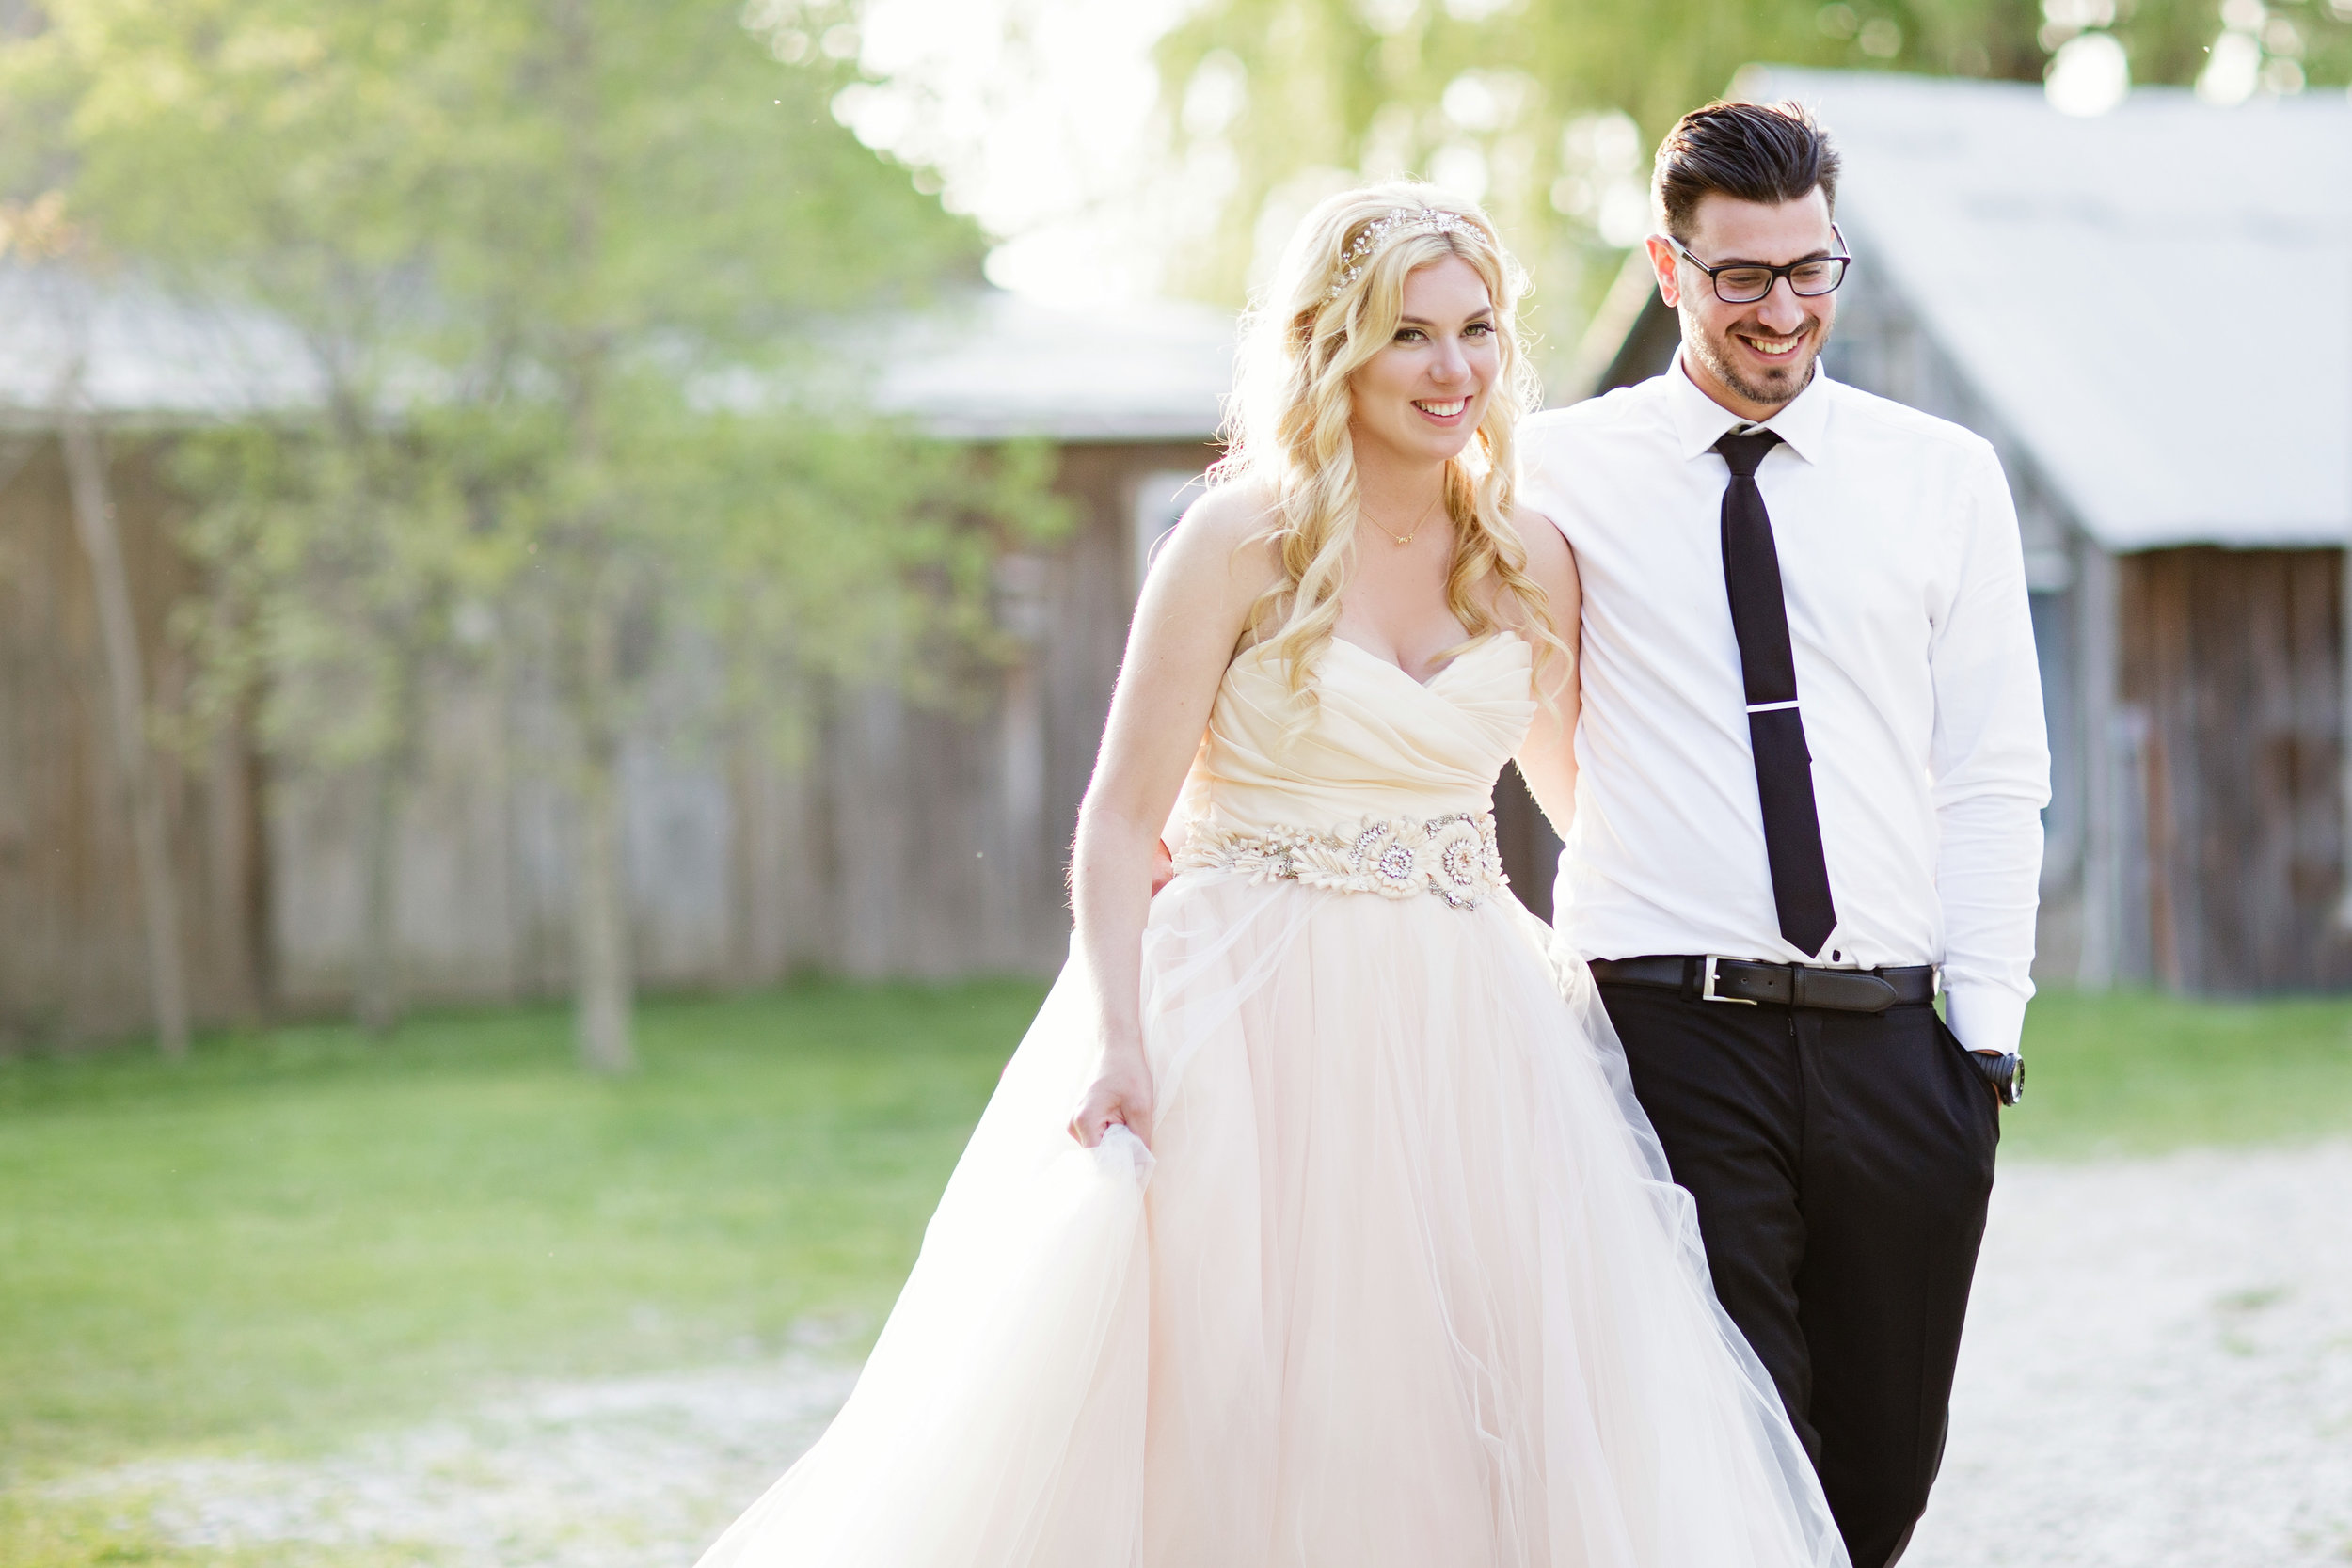 stylish-wedding-photography-windsor-toronto-ontario-wedding-photographer-winery-eryn-shea-photography-04.jpg